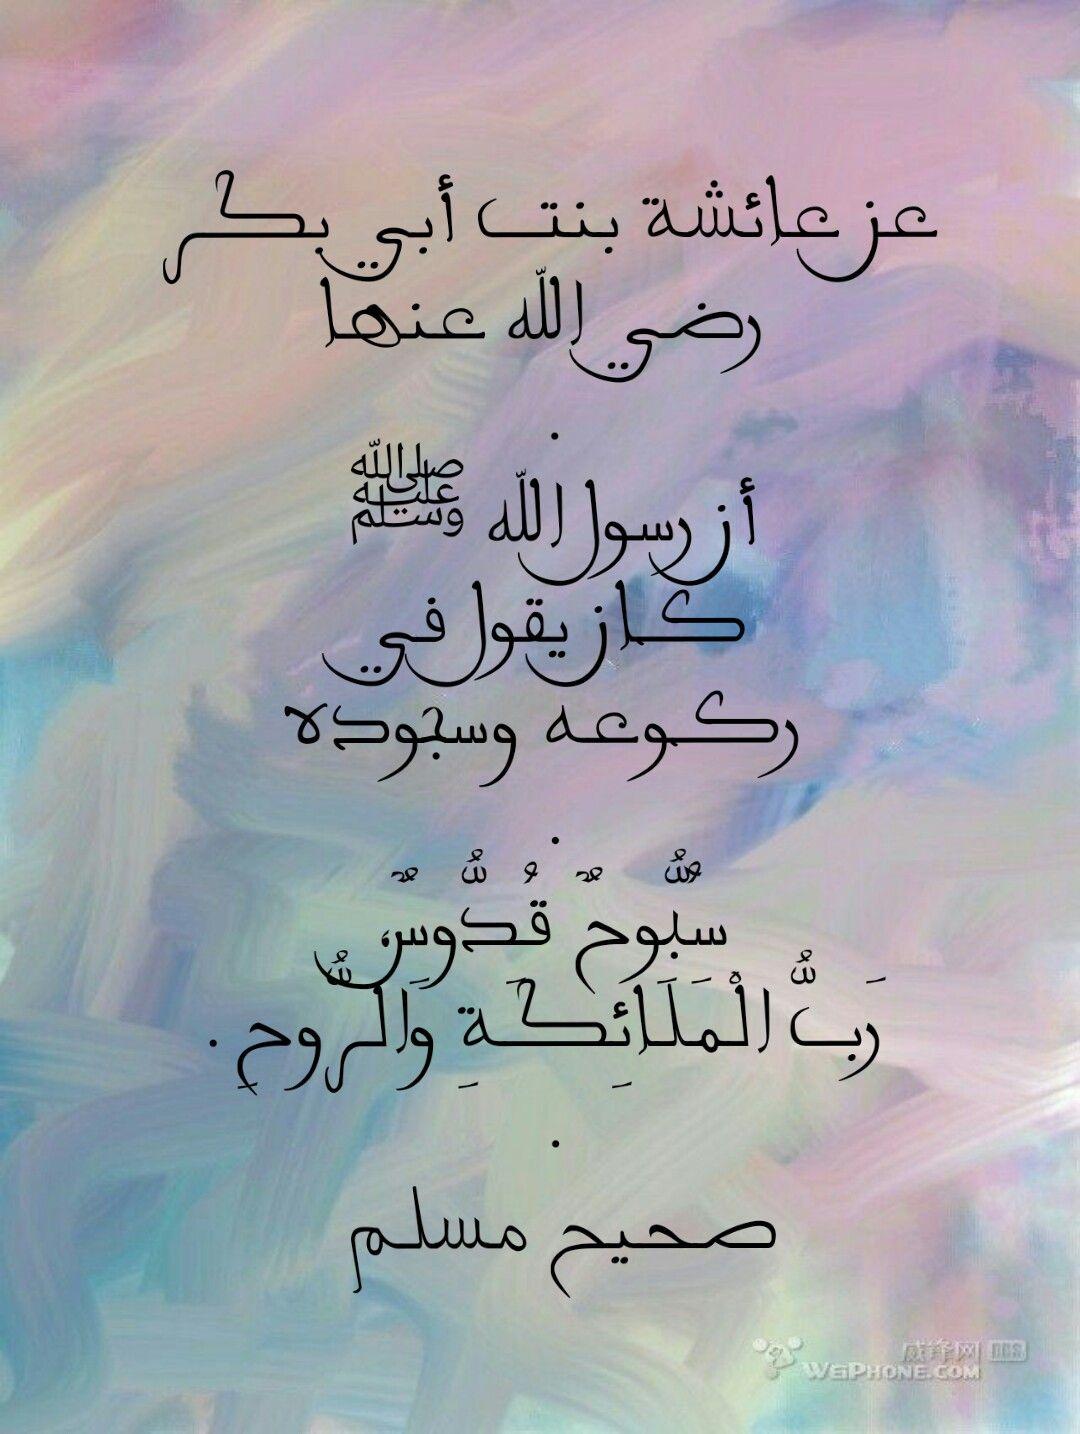 دعاء الركوع Wisdom Arabic Calligraphy Calligraphy